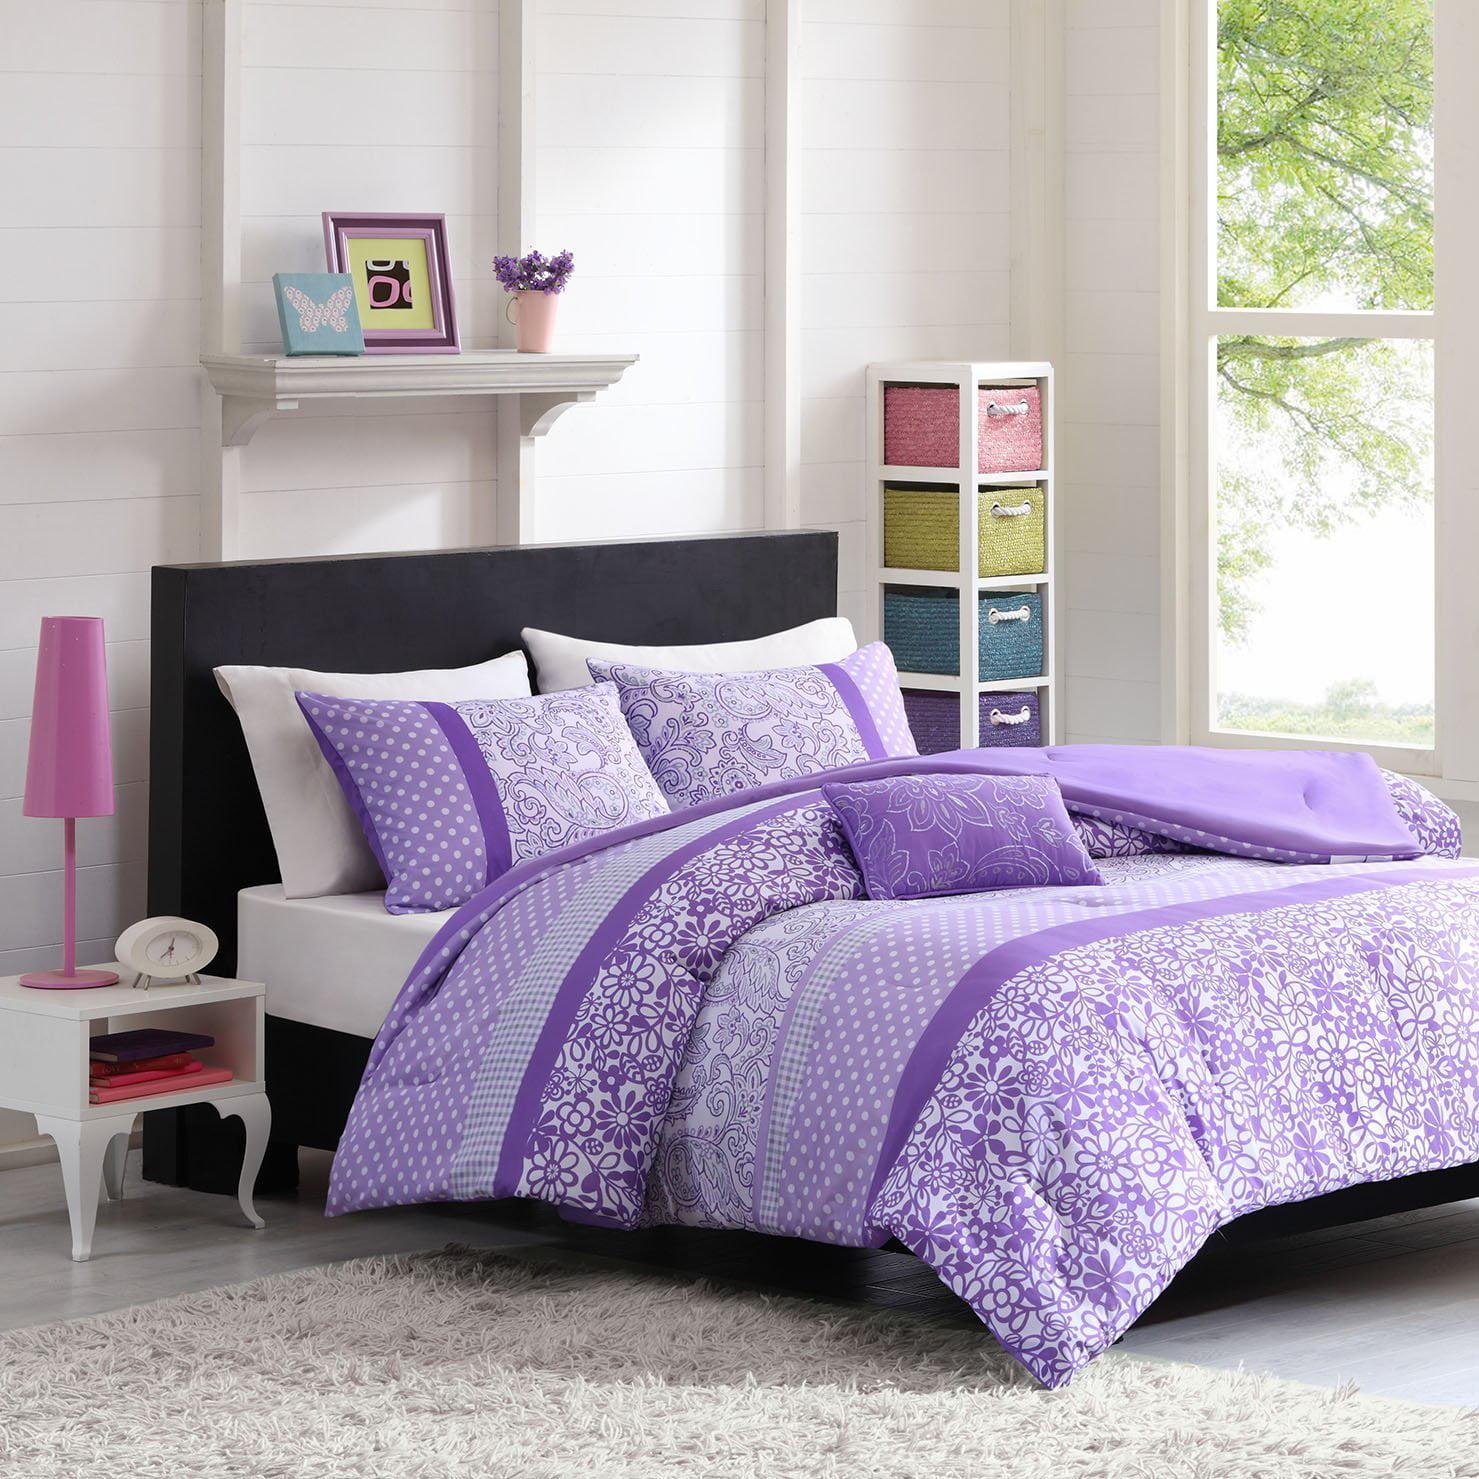 Mizone Riley 3 Piece Comforter Set Twin Twin X Large Purple 1 Comforter 1 Standard Sham 1 Decorative Pillow By Mi Zone Walmart Com Walmart Com